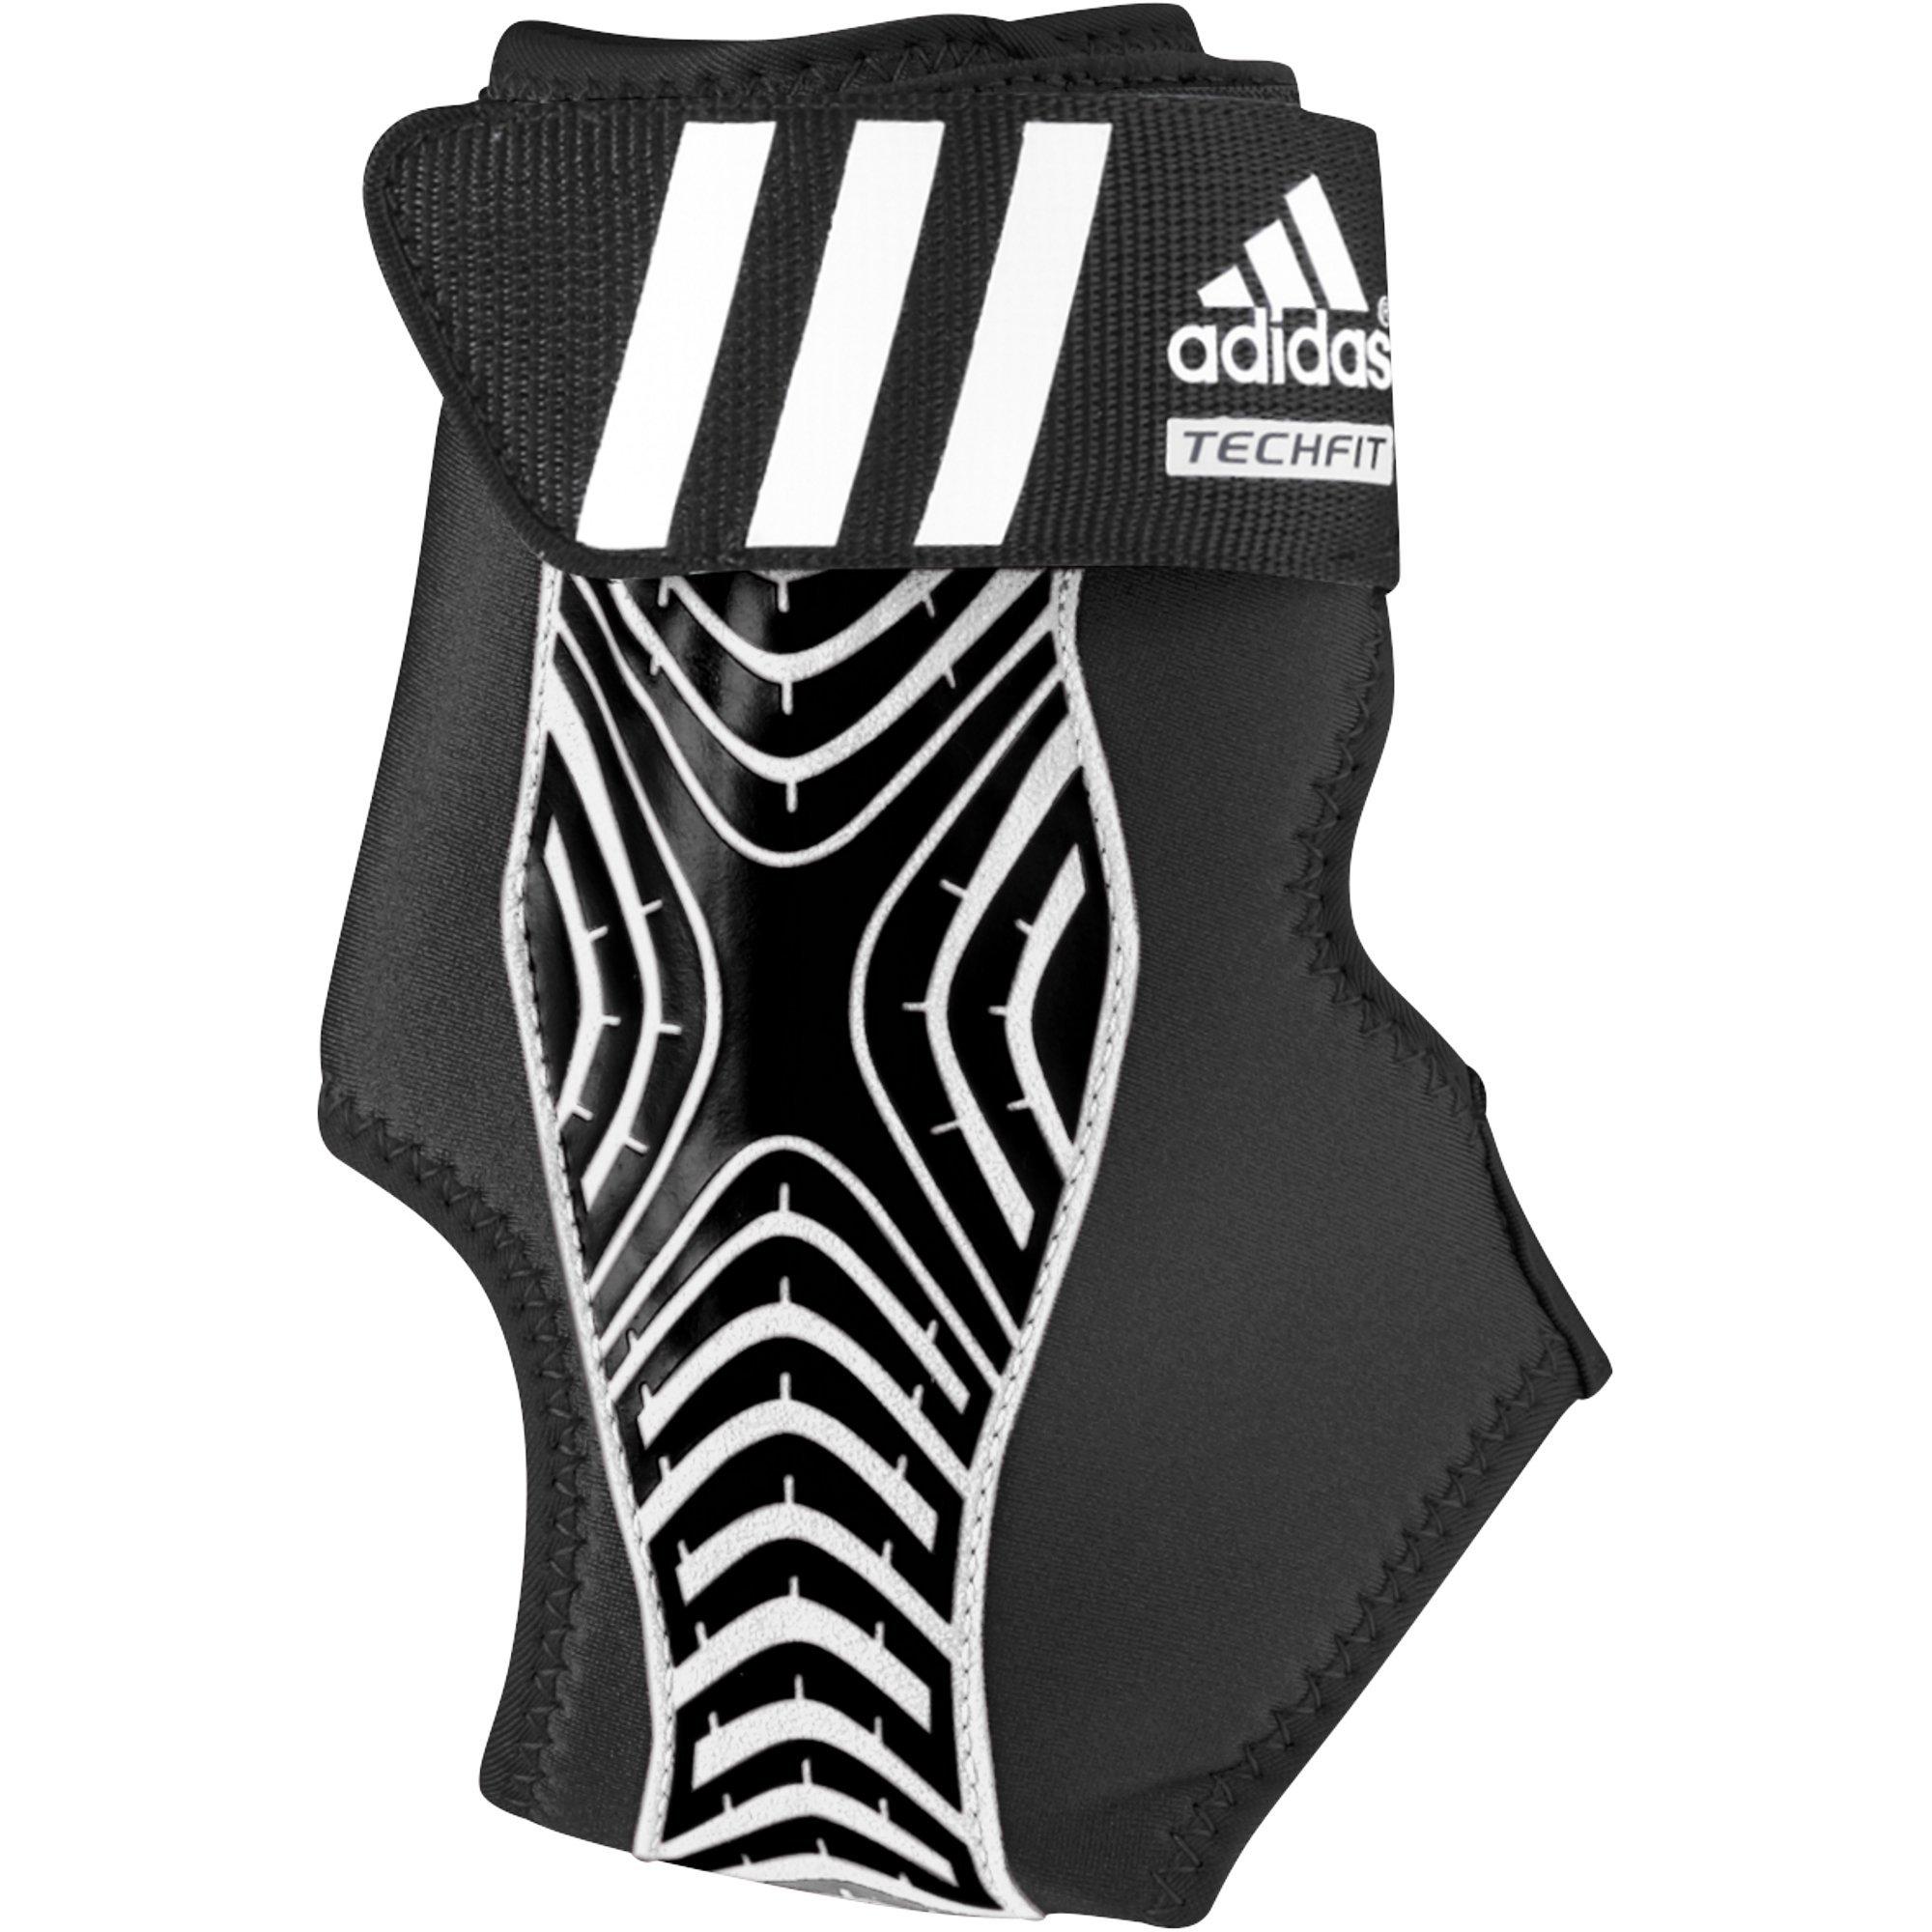 adidas Adizero Speedwrap Ankle Brace, Black/White, Small